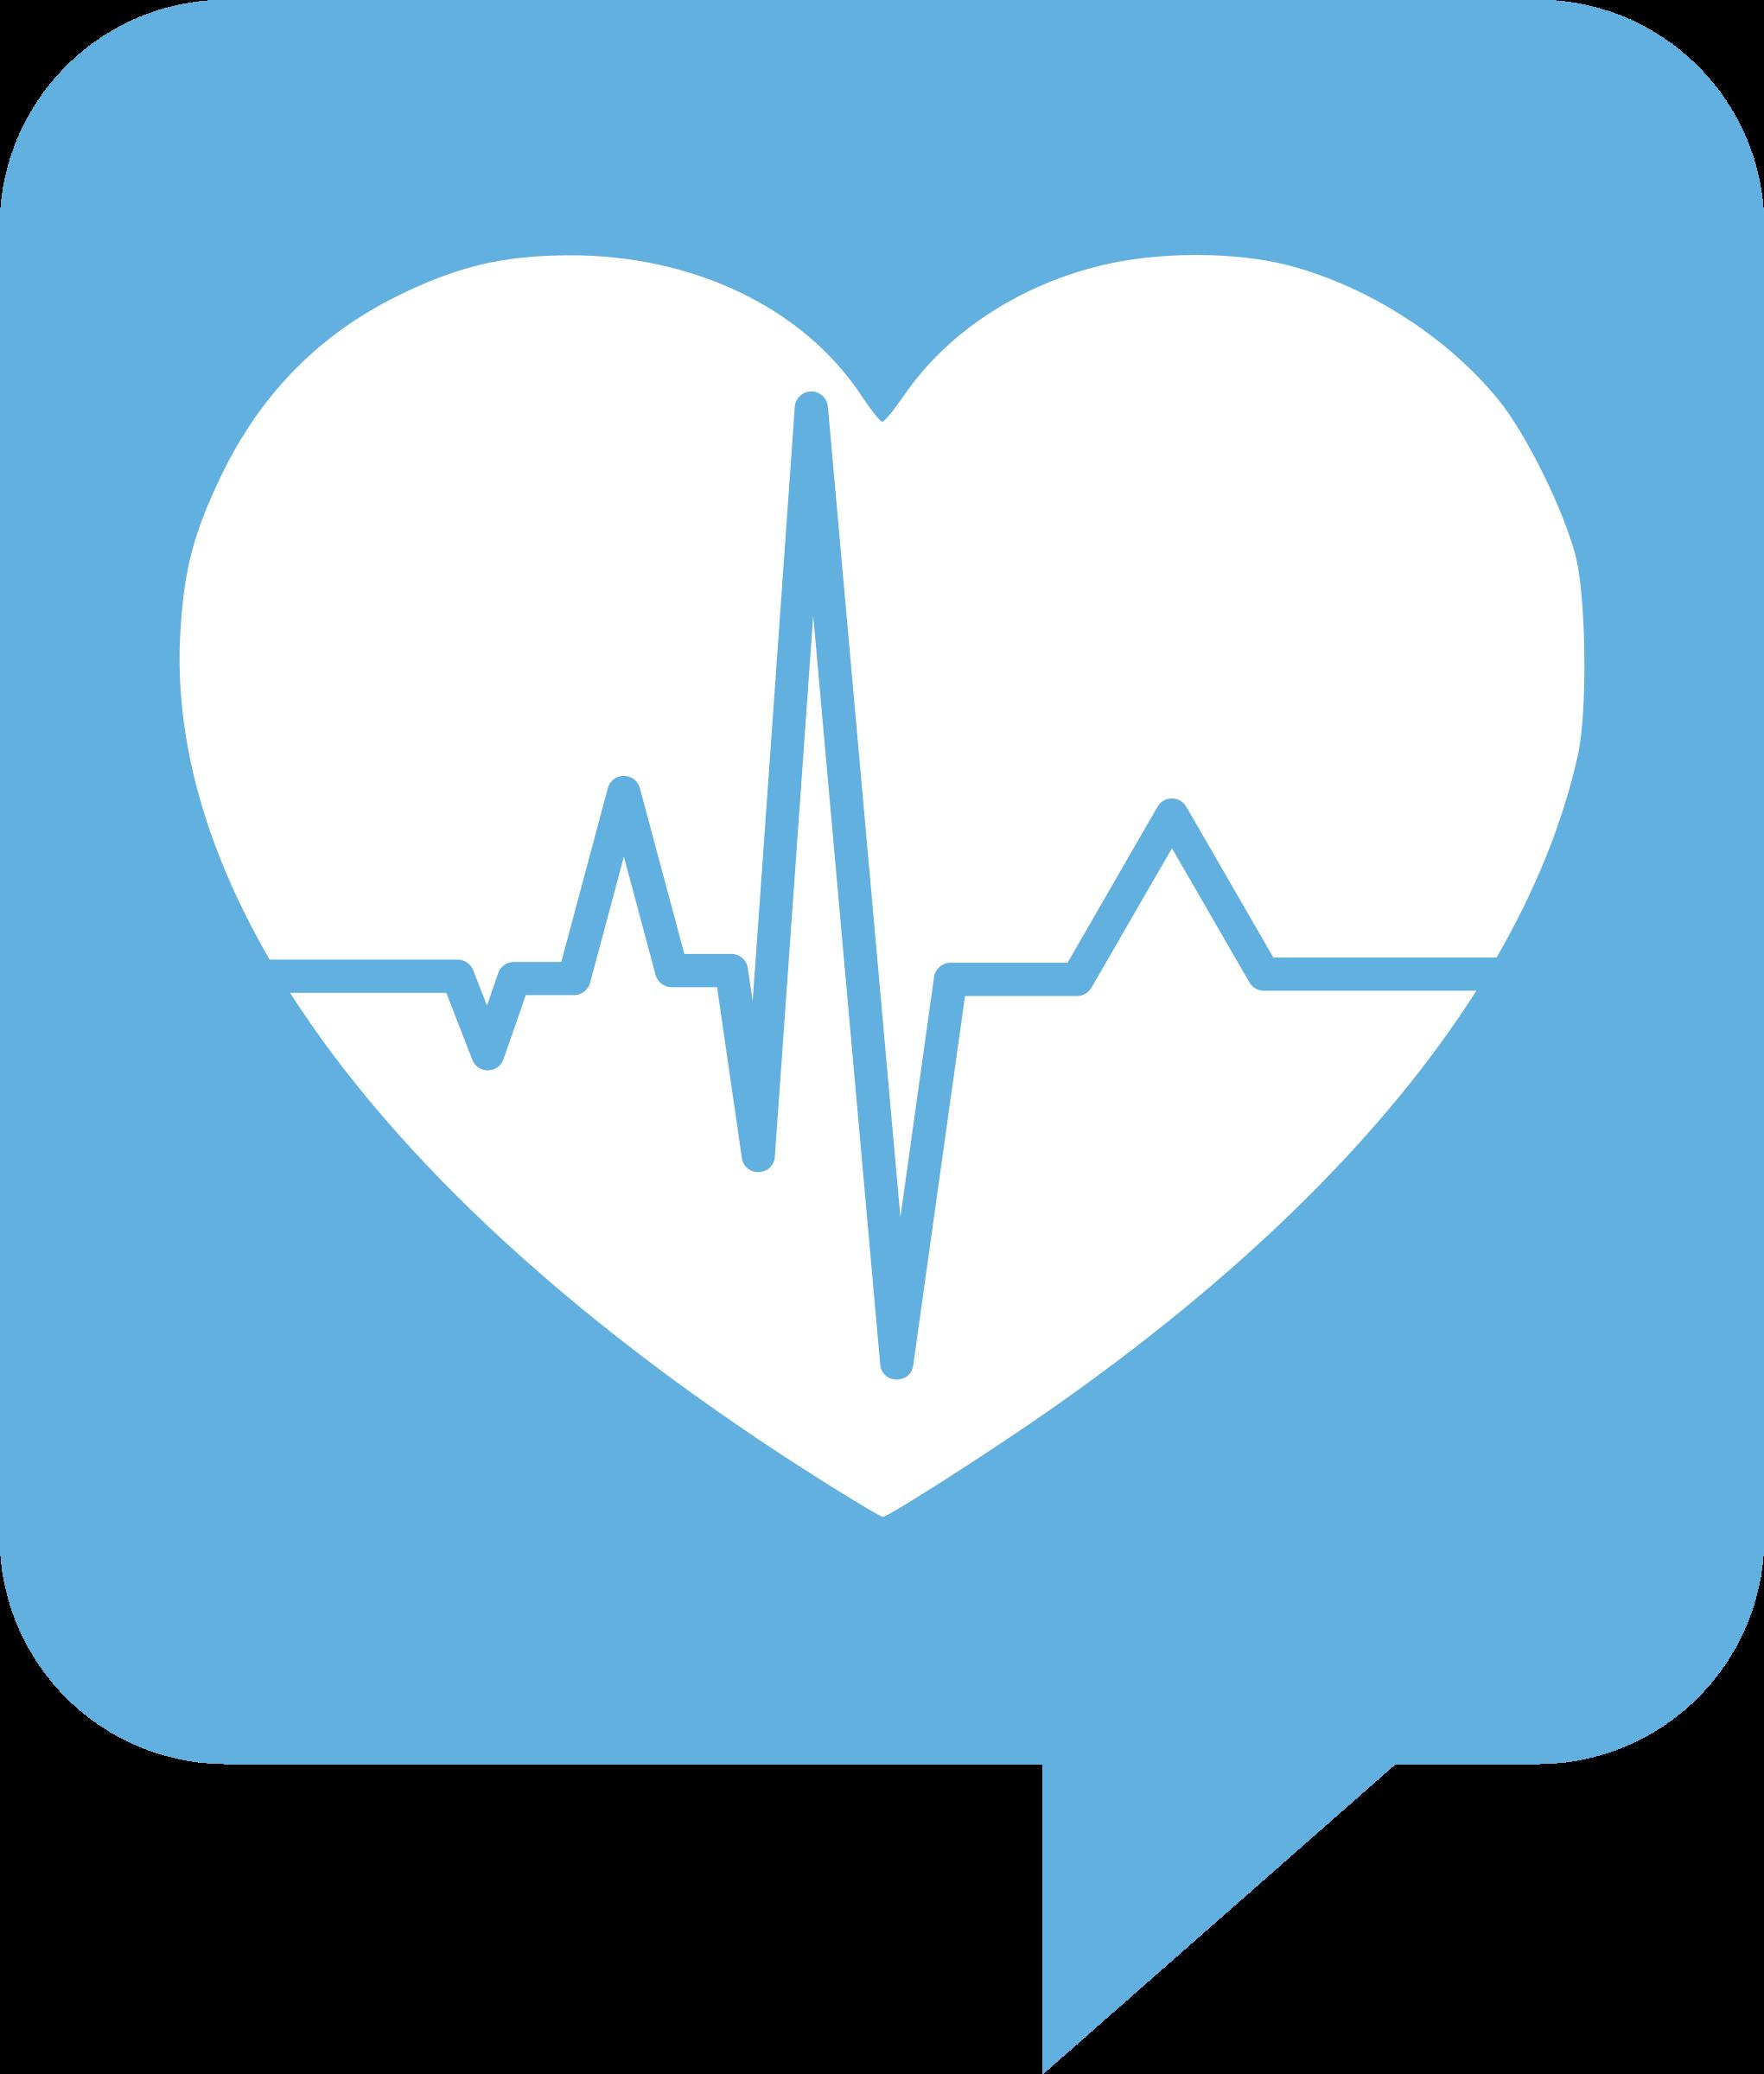 free stock Heartbeat clipart. Logo for health se.